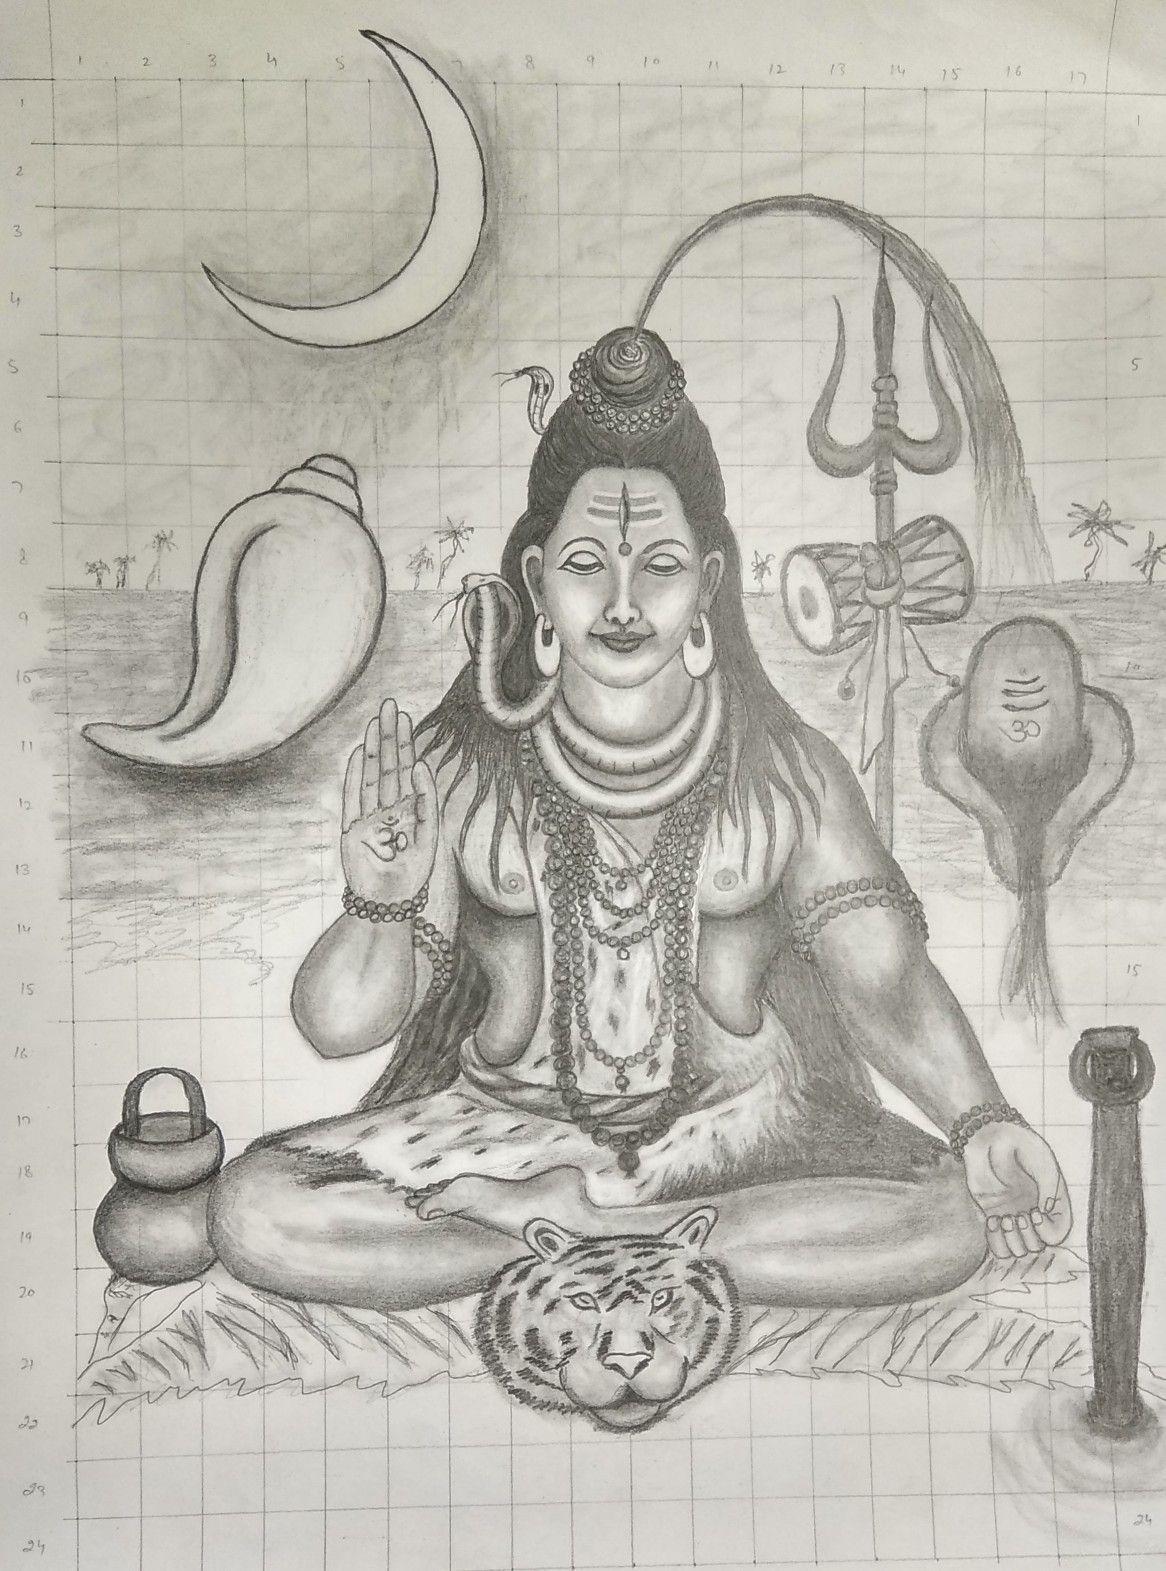 Pencil sketch of mahadeva